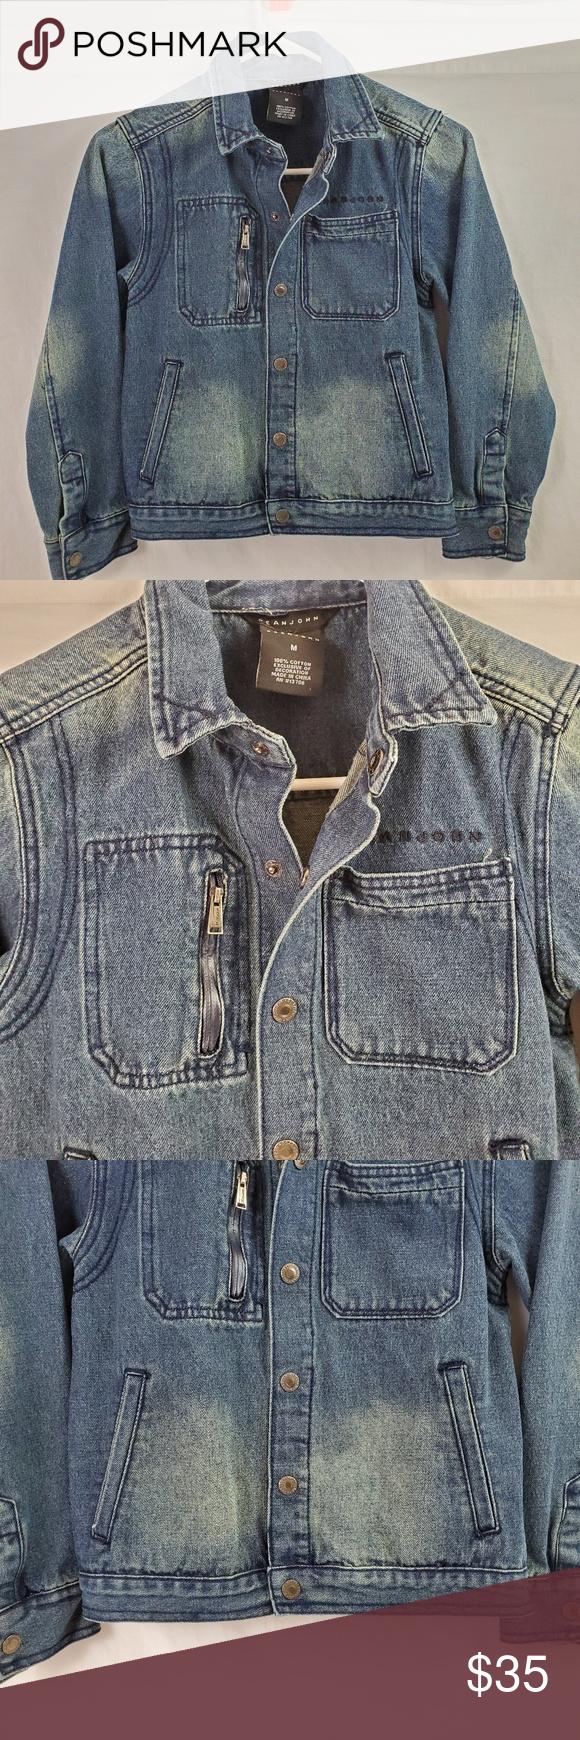 Seanjohn Distressed Denim Jacket Blue Medium 693 Distressed Denim Jacket Denim Jacket Distressed Denim [ 1740 x 580 Pixel ]